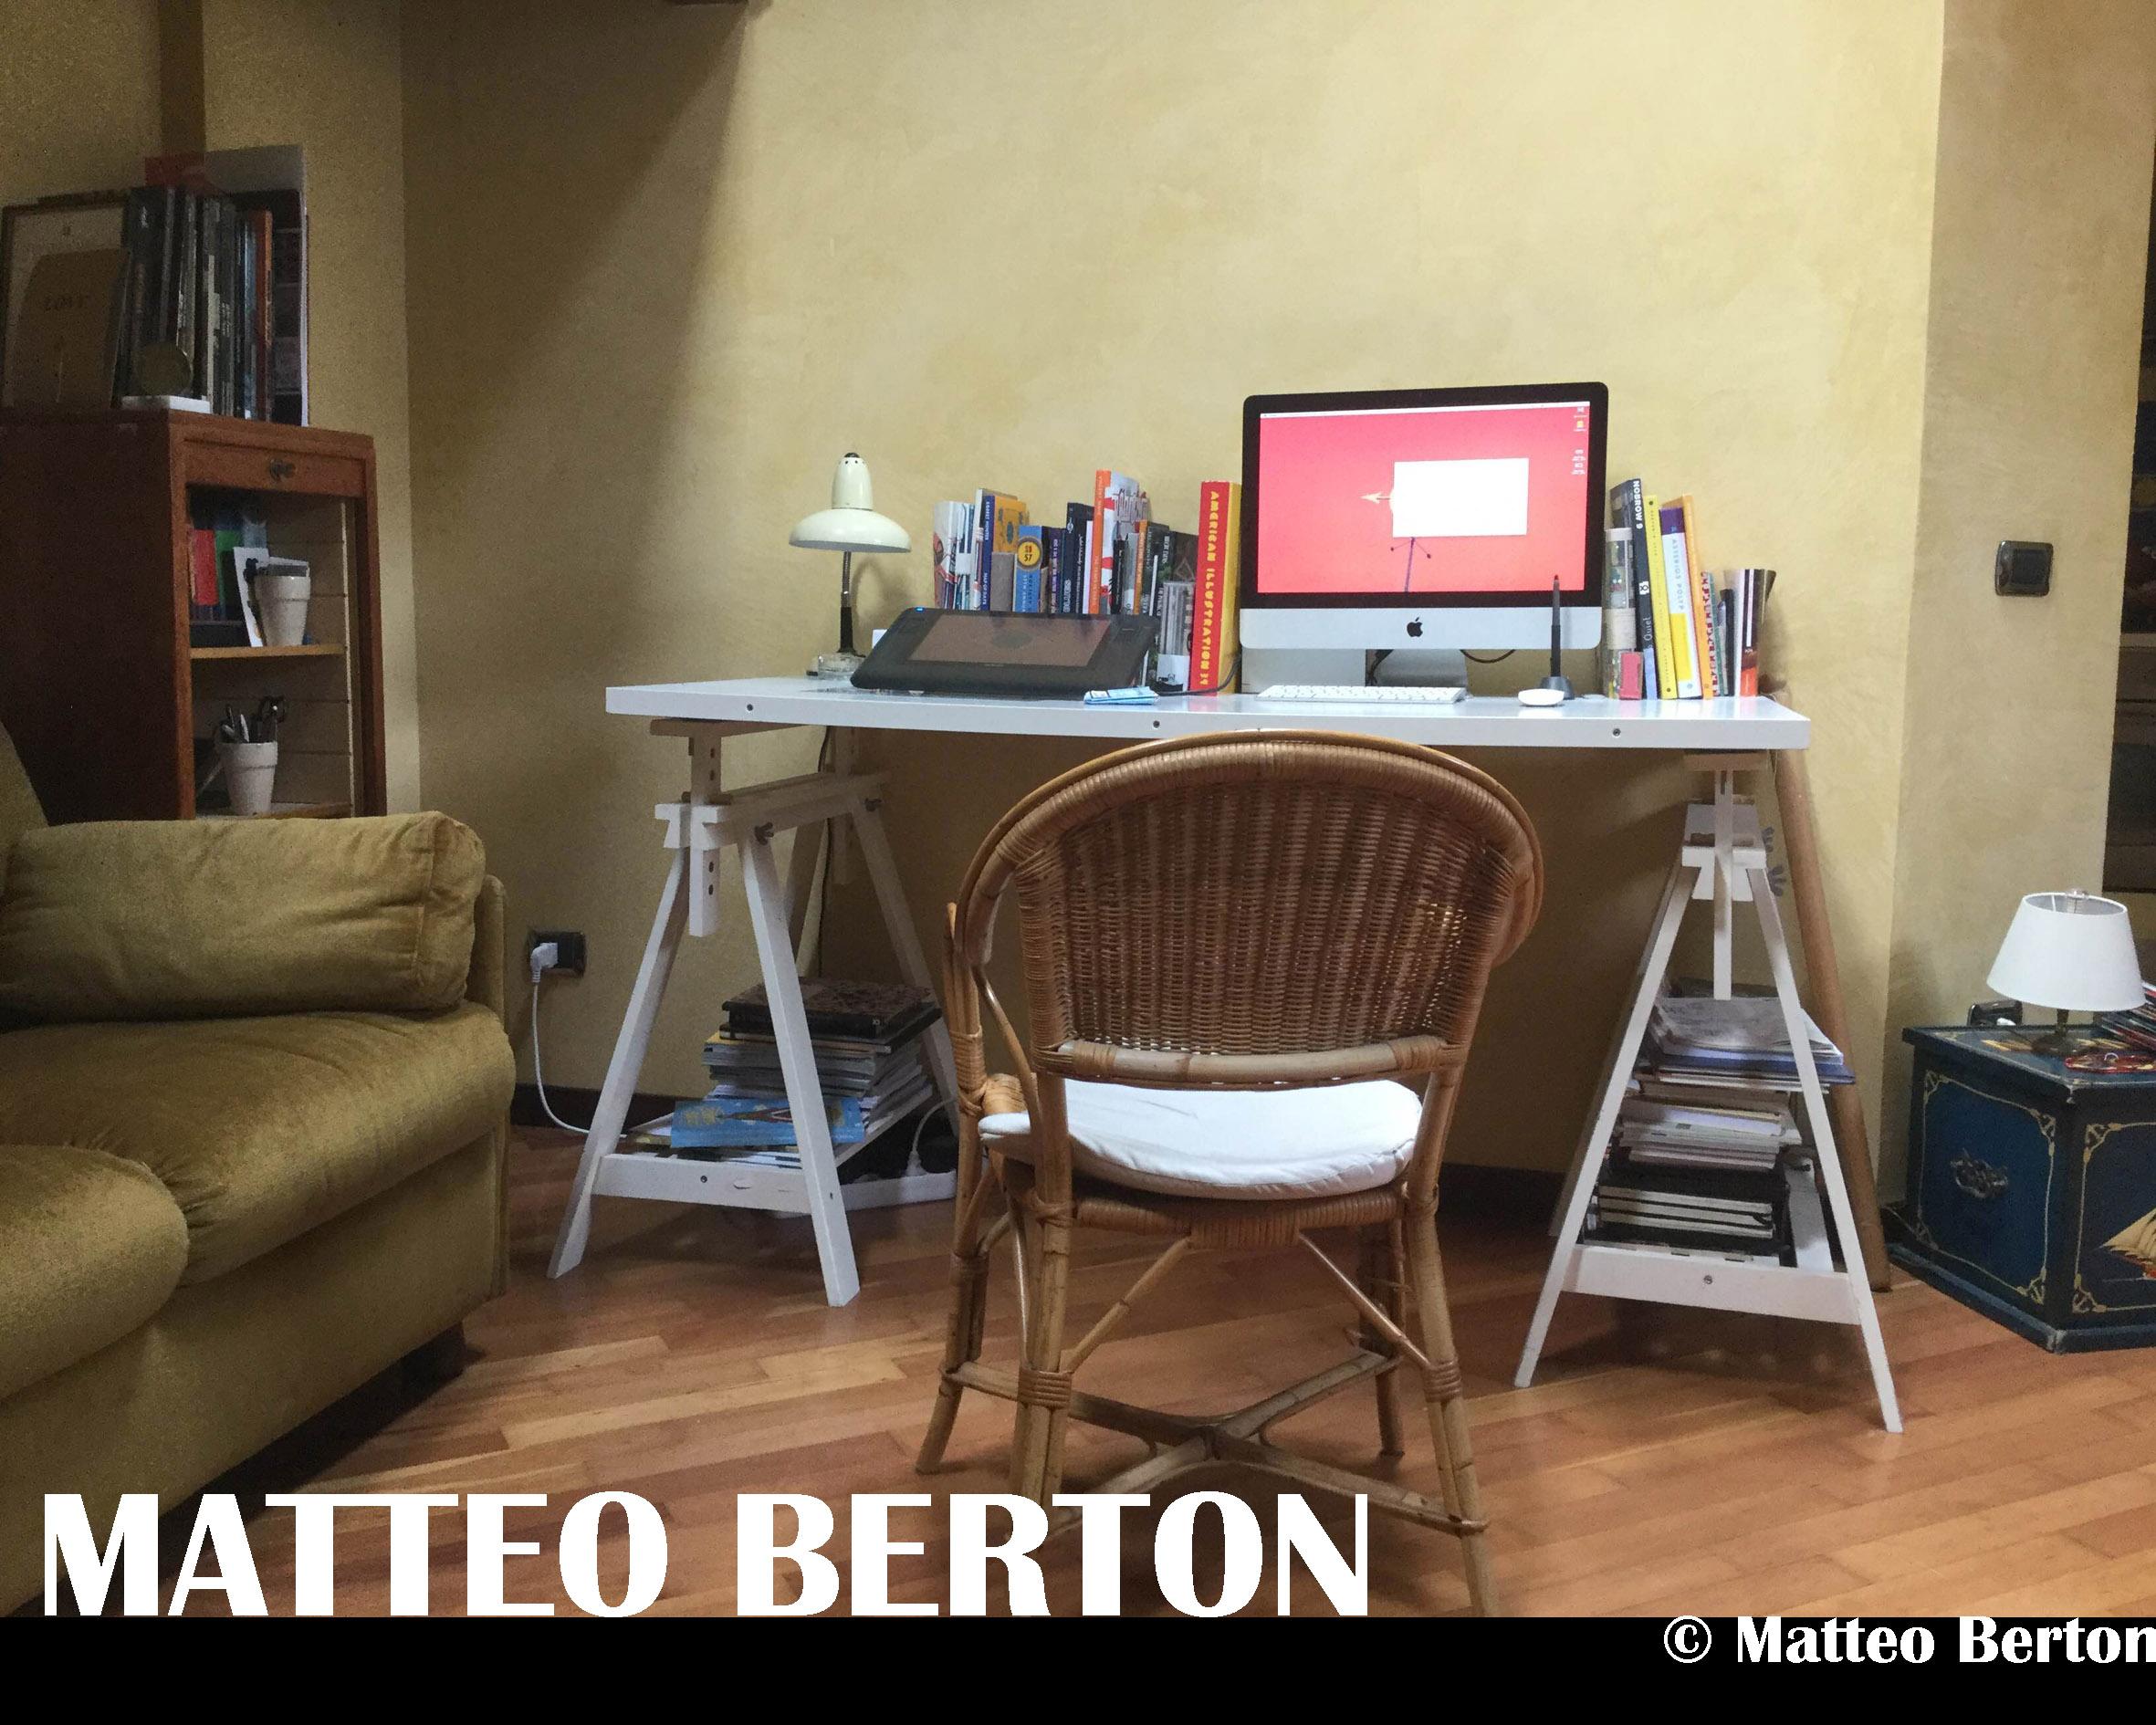 Matteo Berton